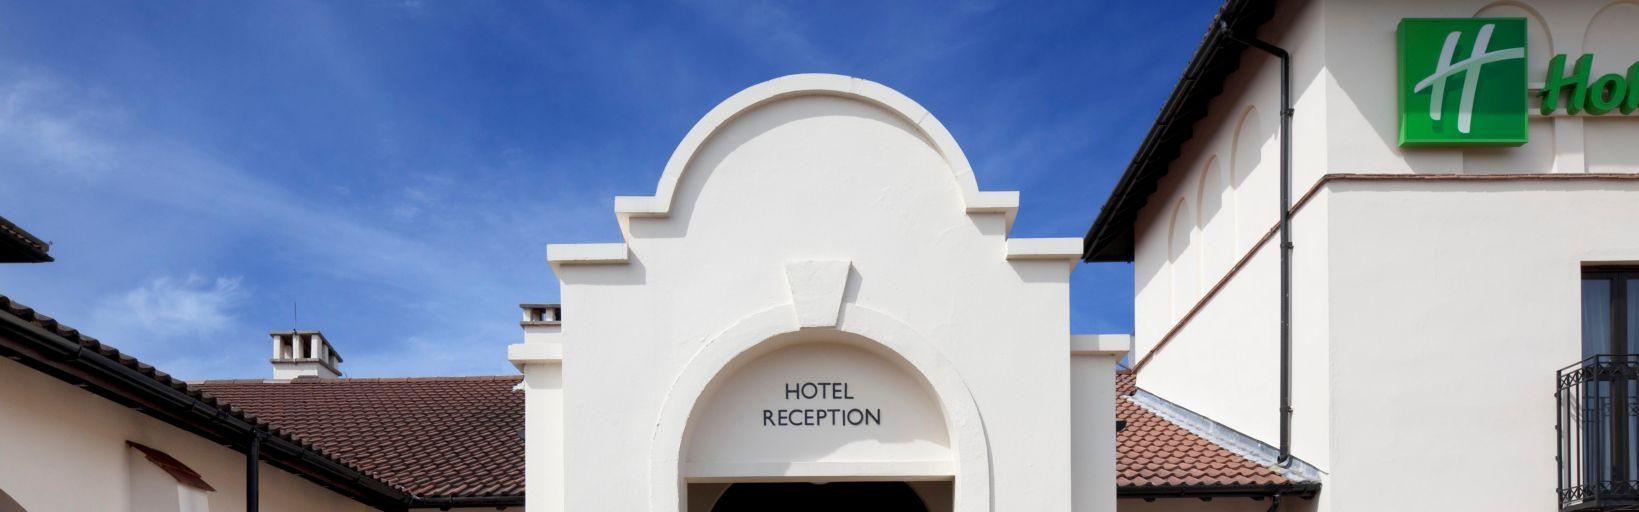 Holiday Inn Birmingham Bromsgrove Front Entrance